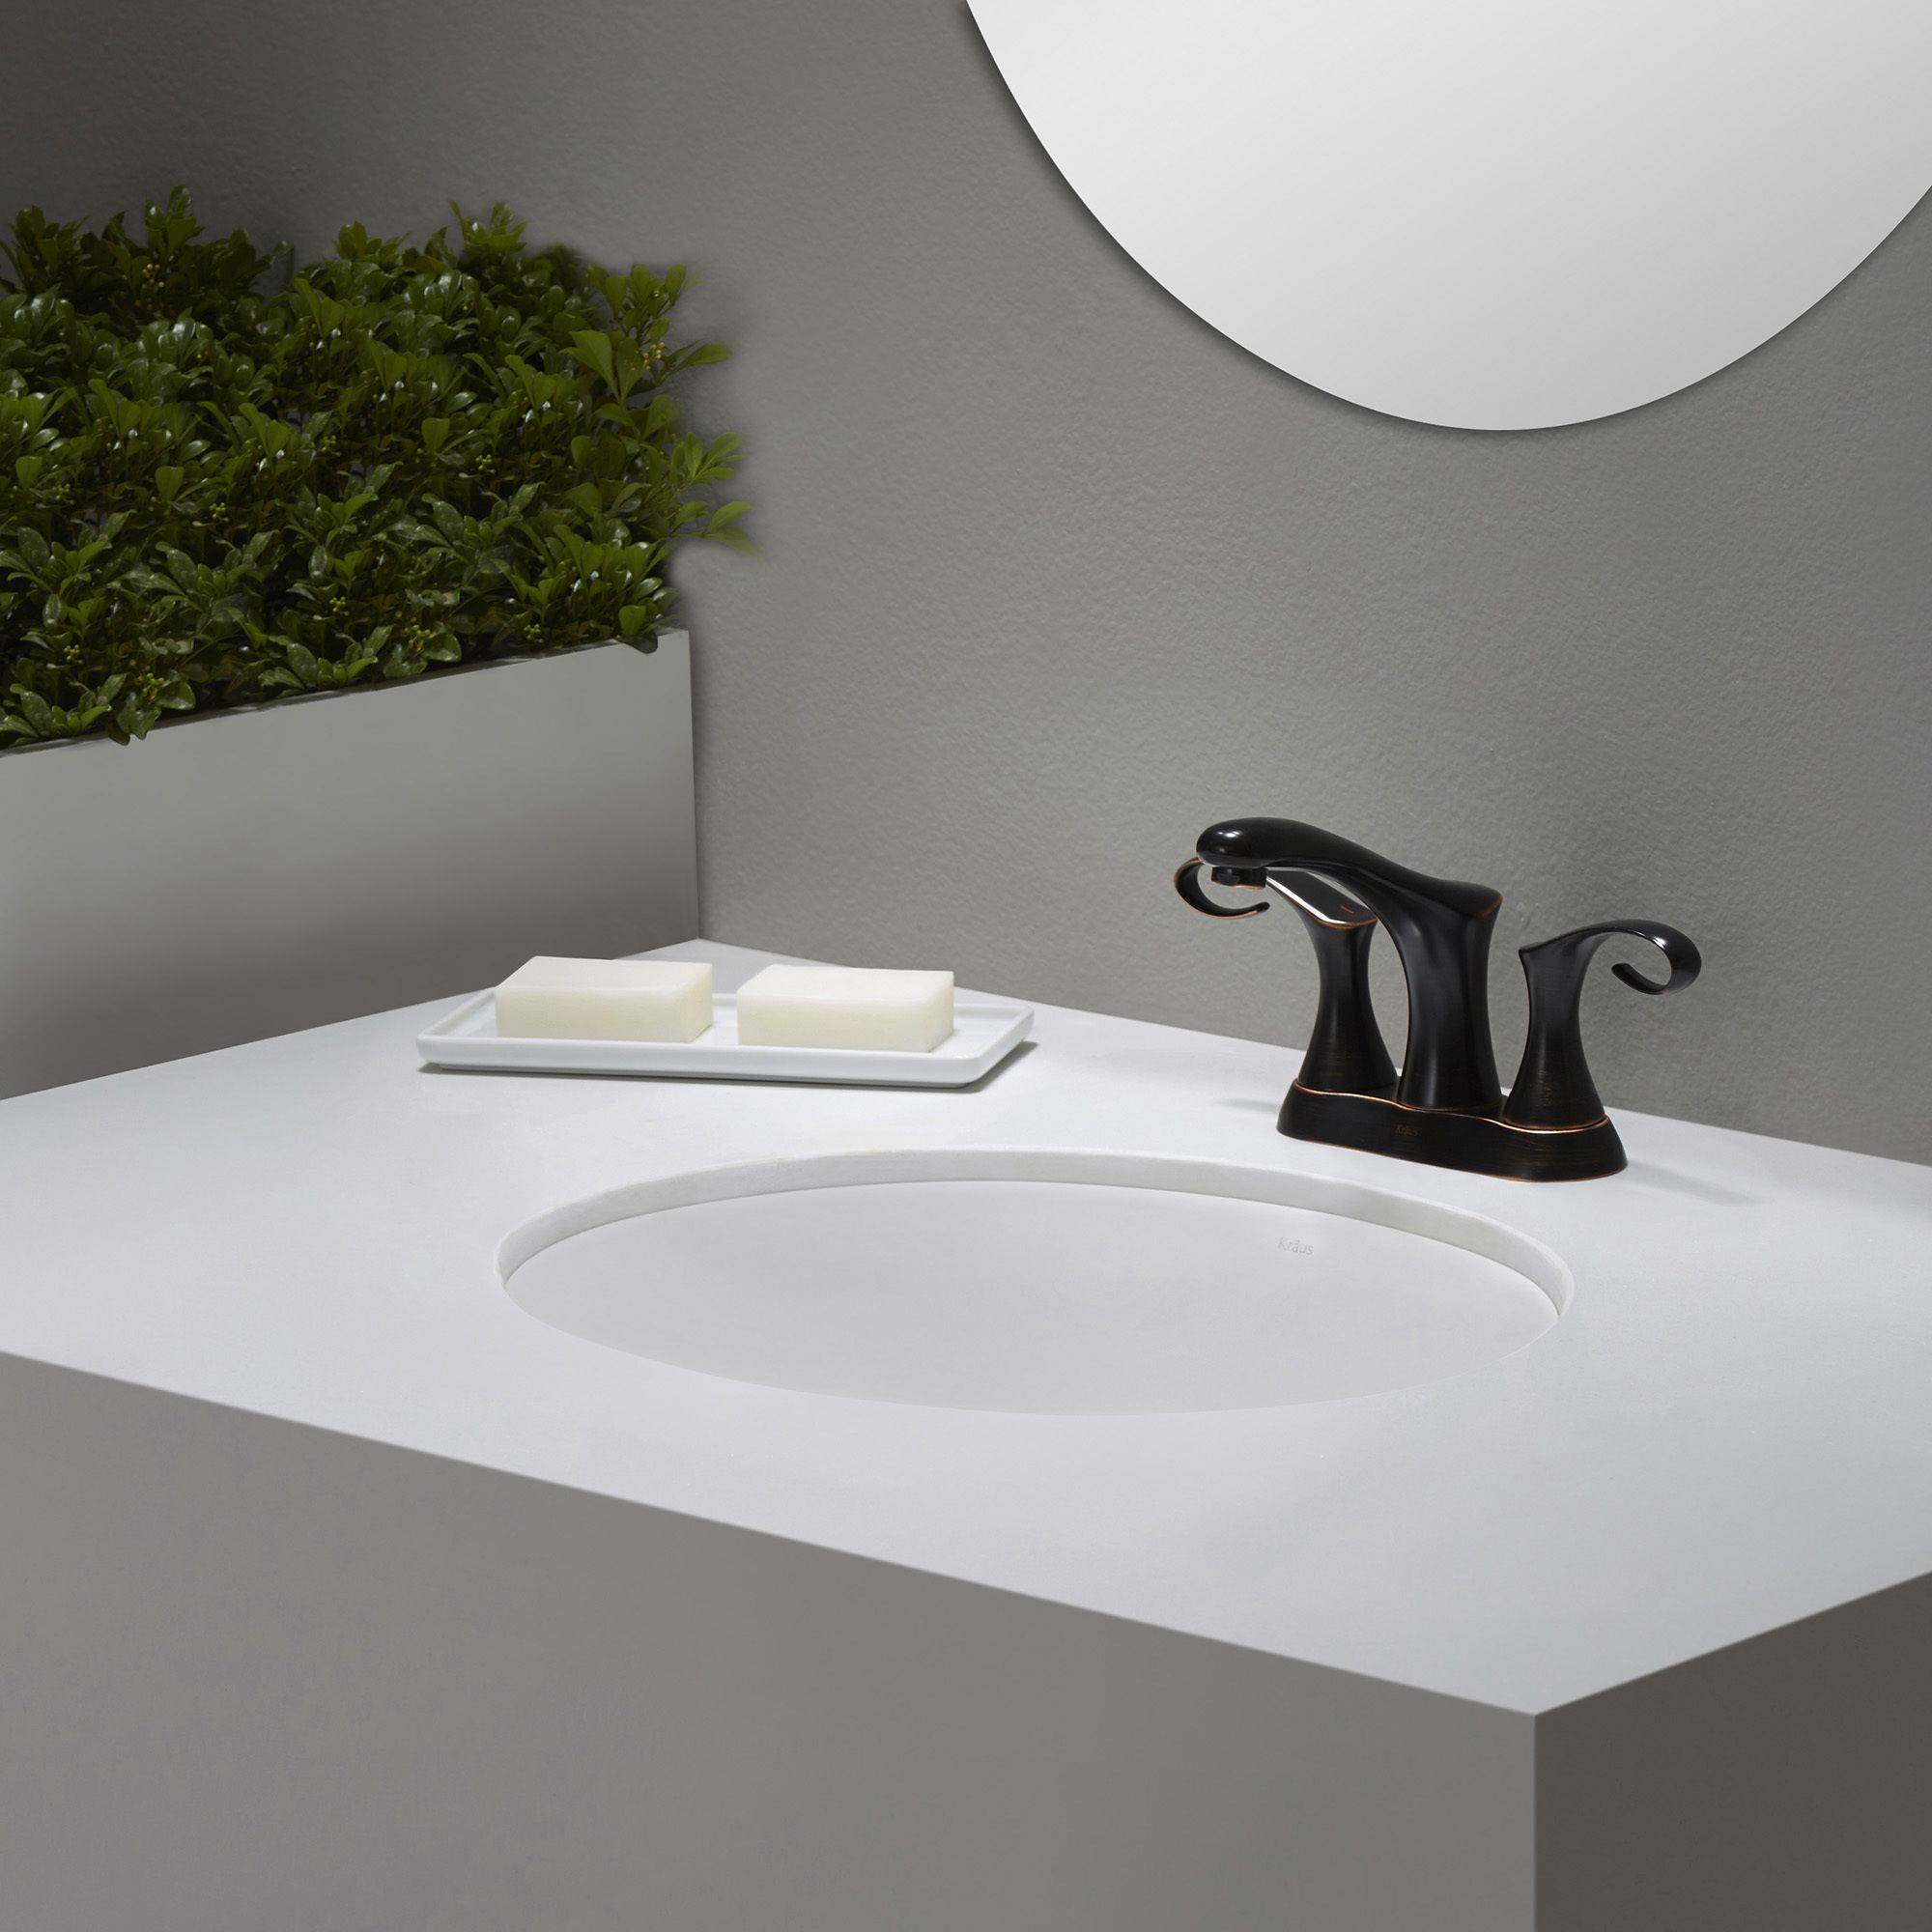 Kraus elavo oval undermount bathroom sink in with overflow